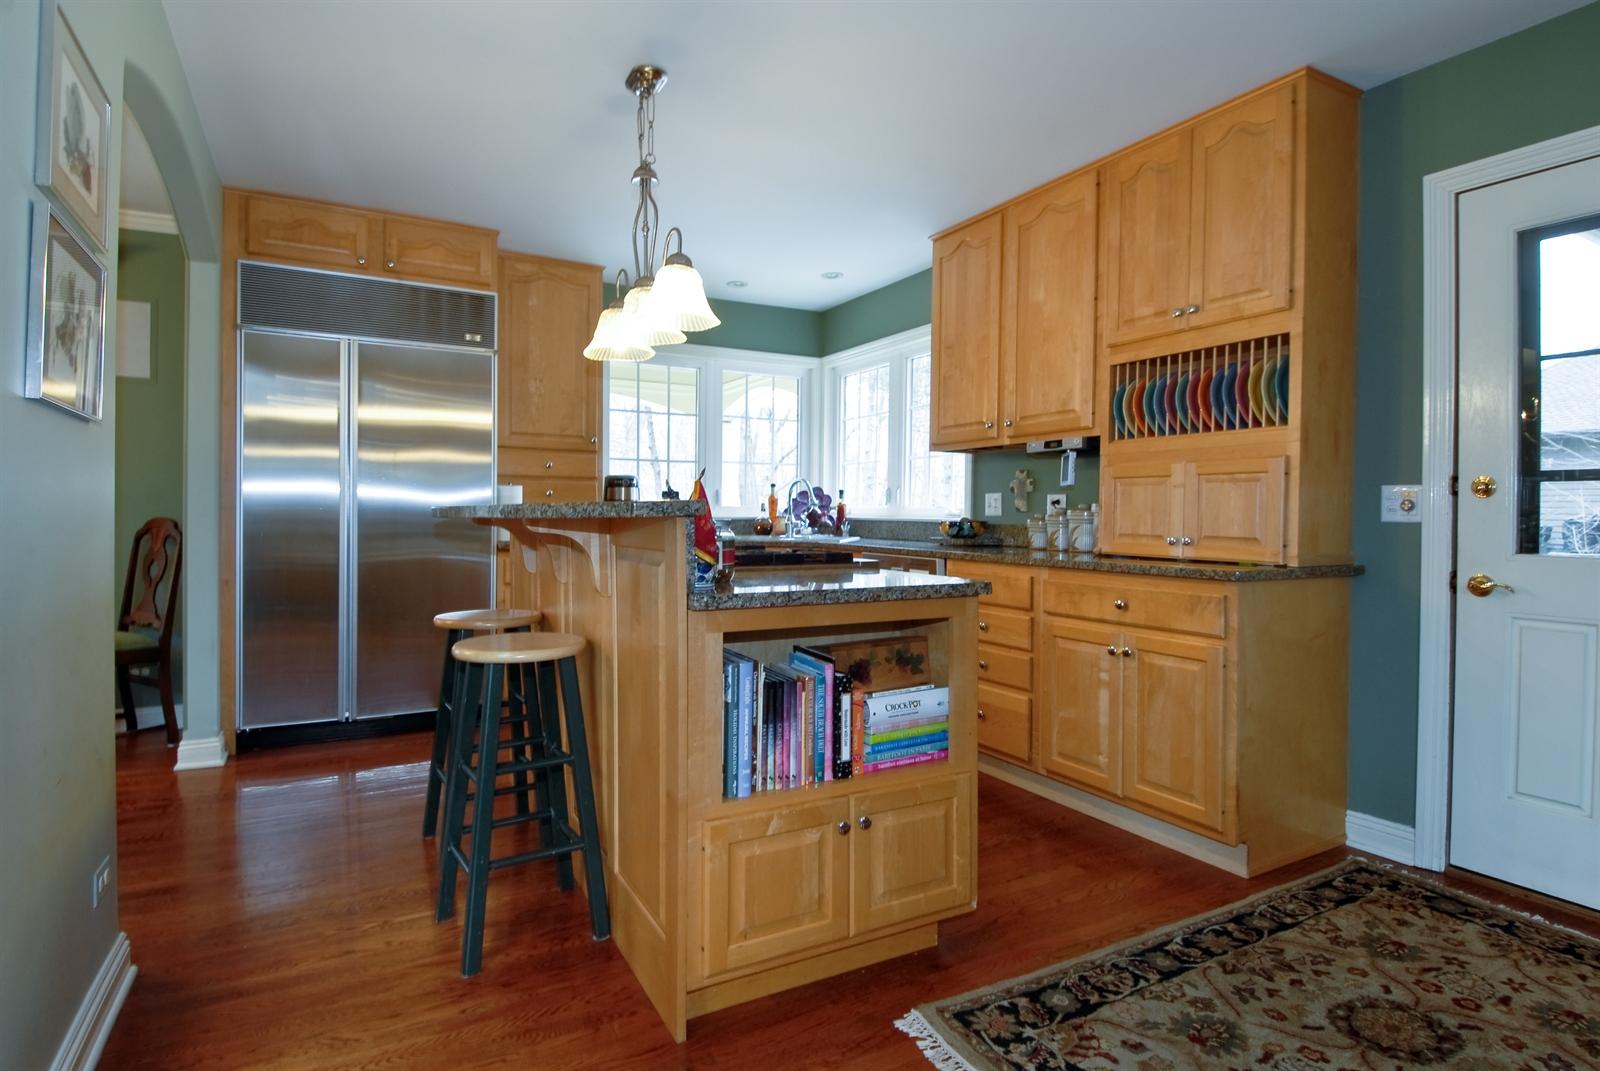 Real Estate Photography - 620 E Gartner Rd, Naperville, IL, 60540 - Kitchen